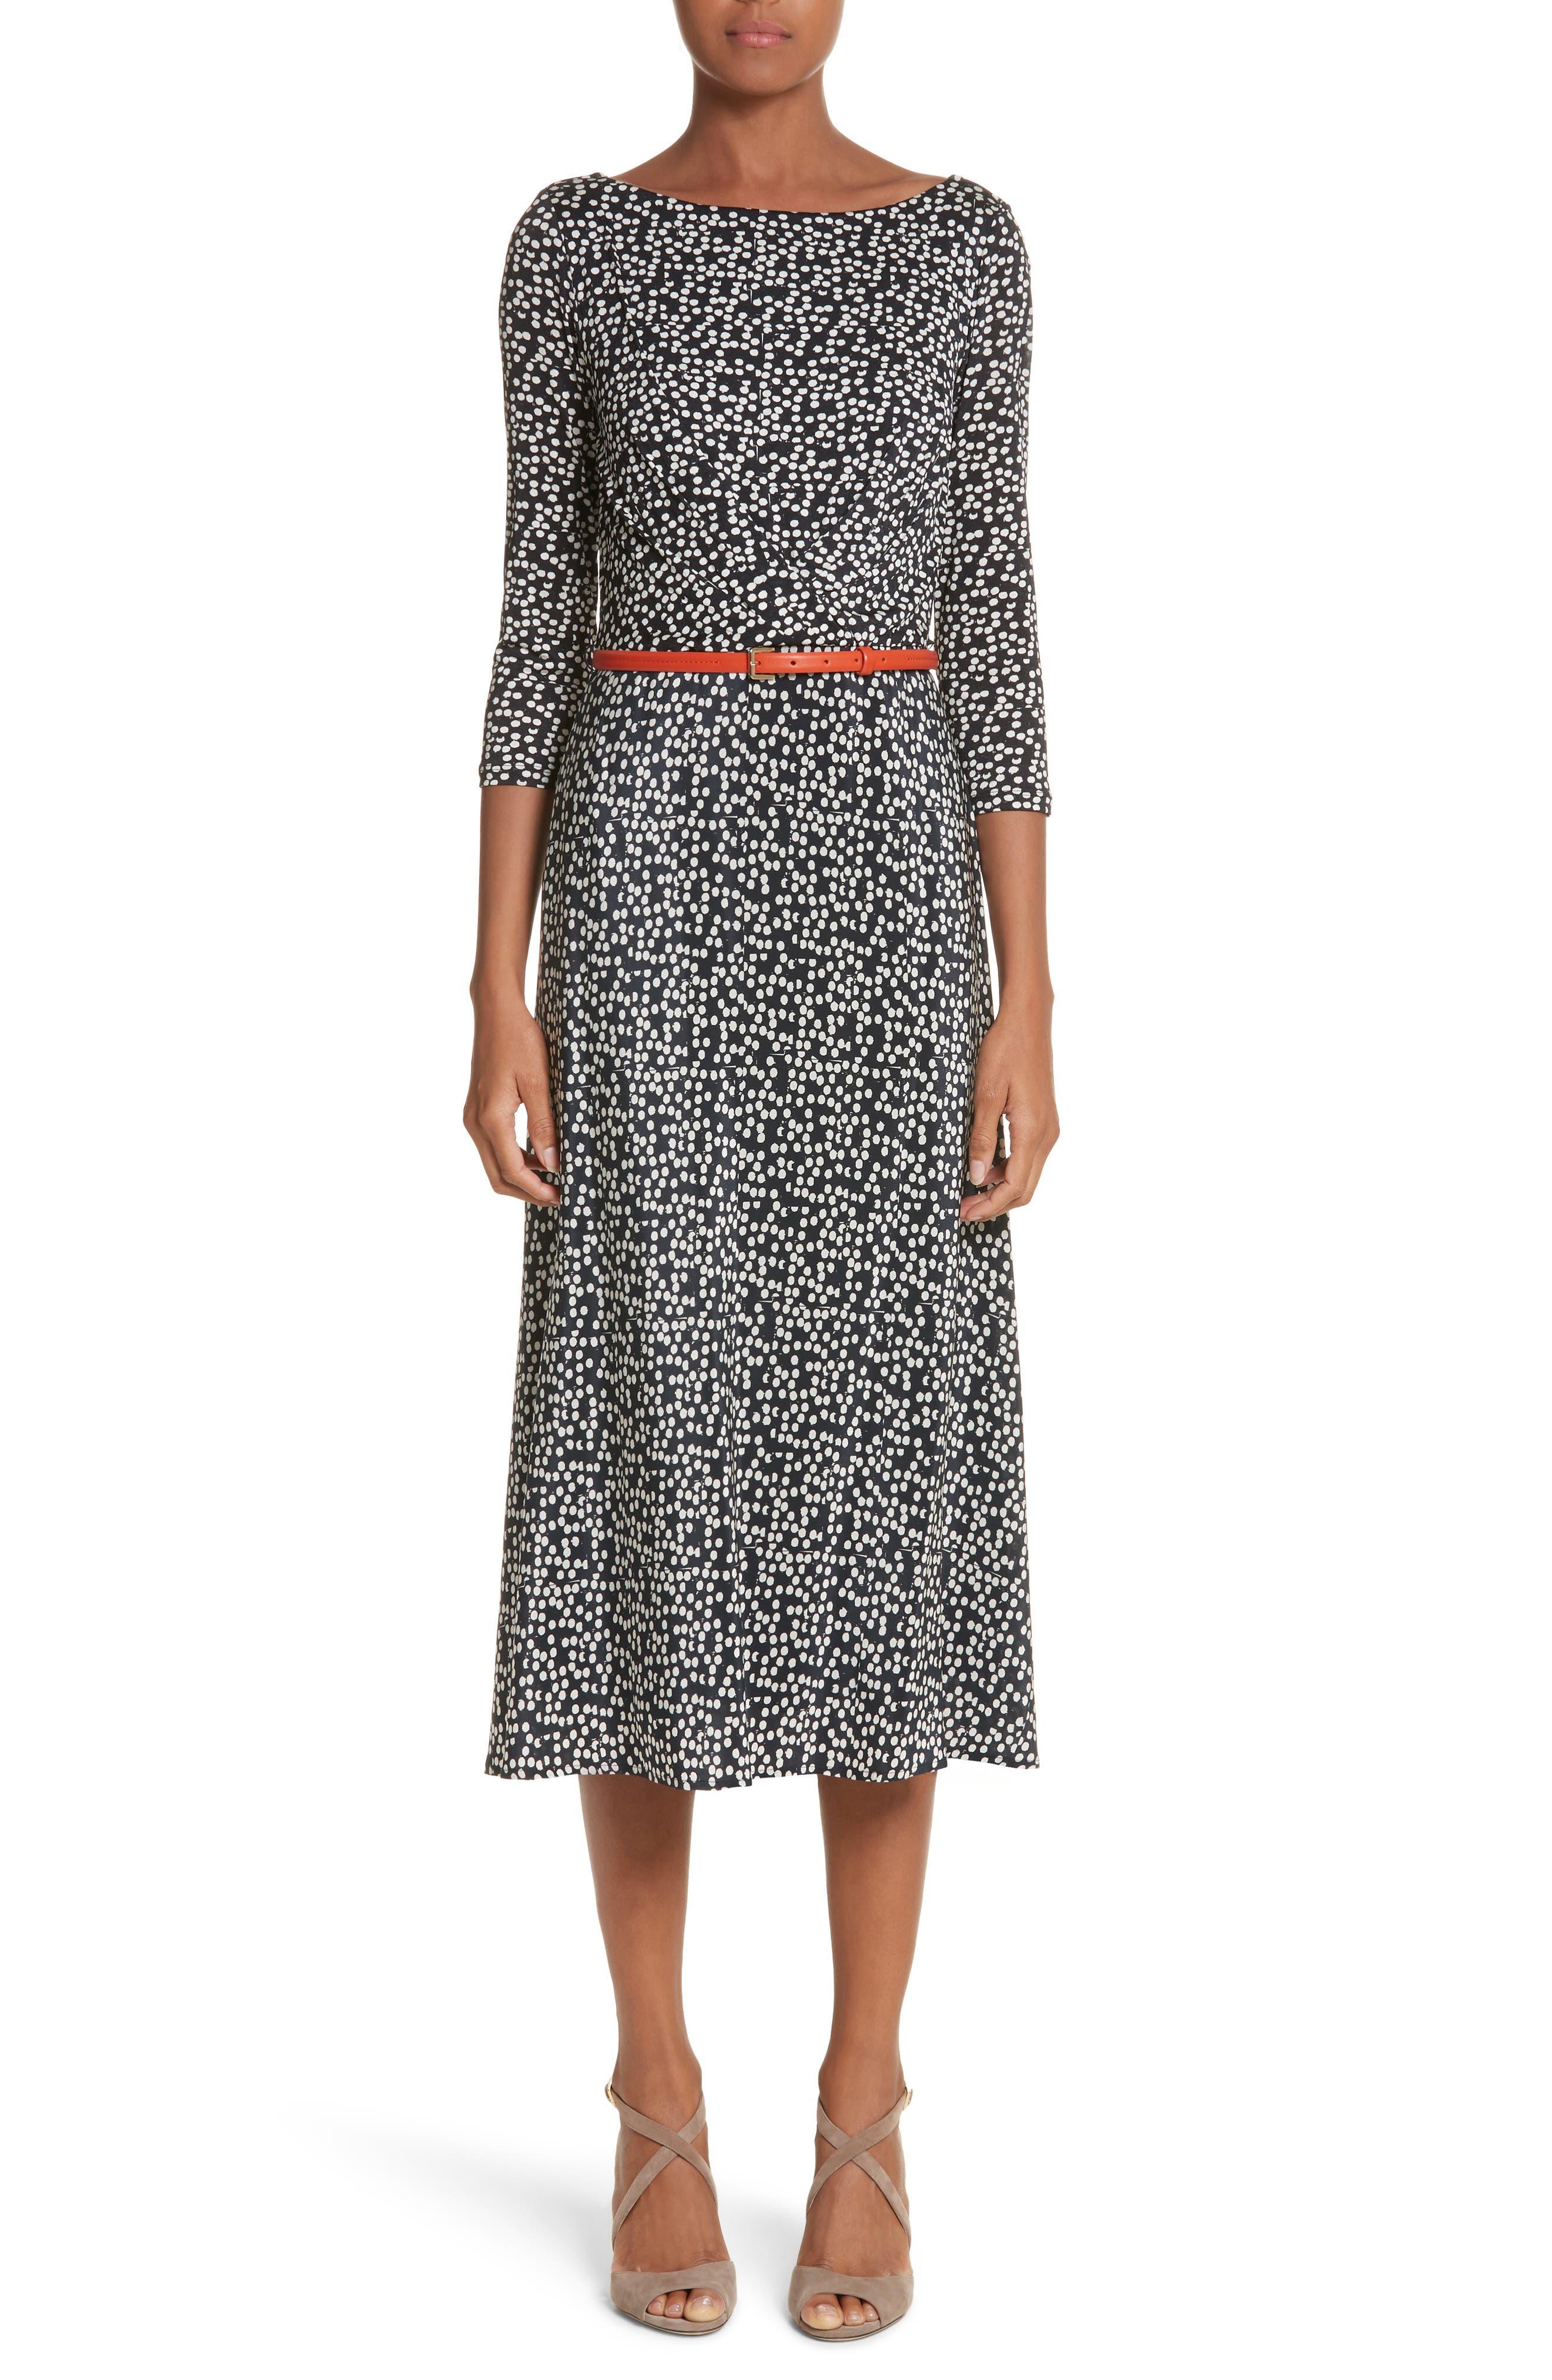 Peter Dot Print Midi Dress,                         Main,                         color, Black